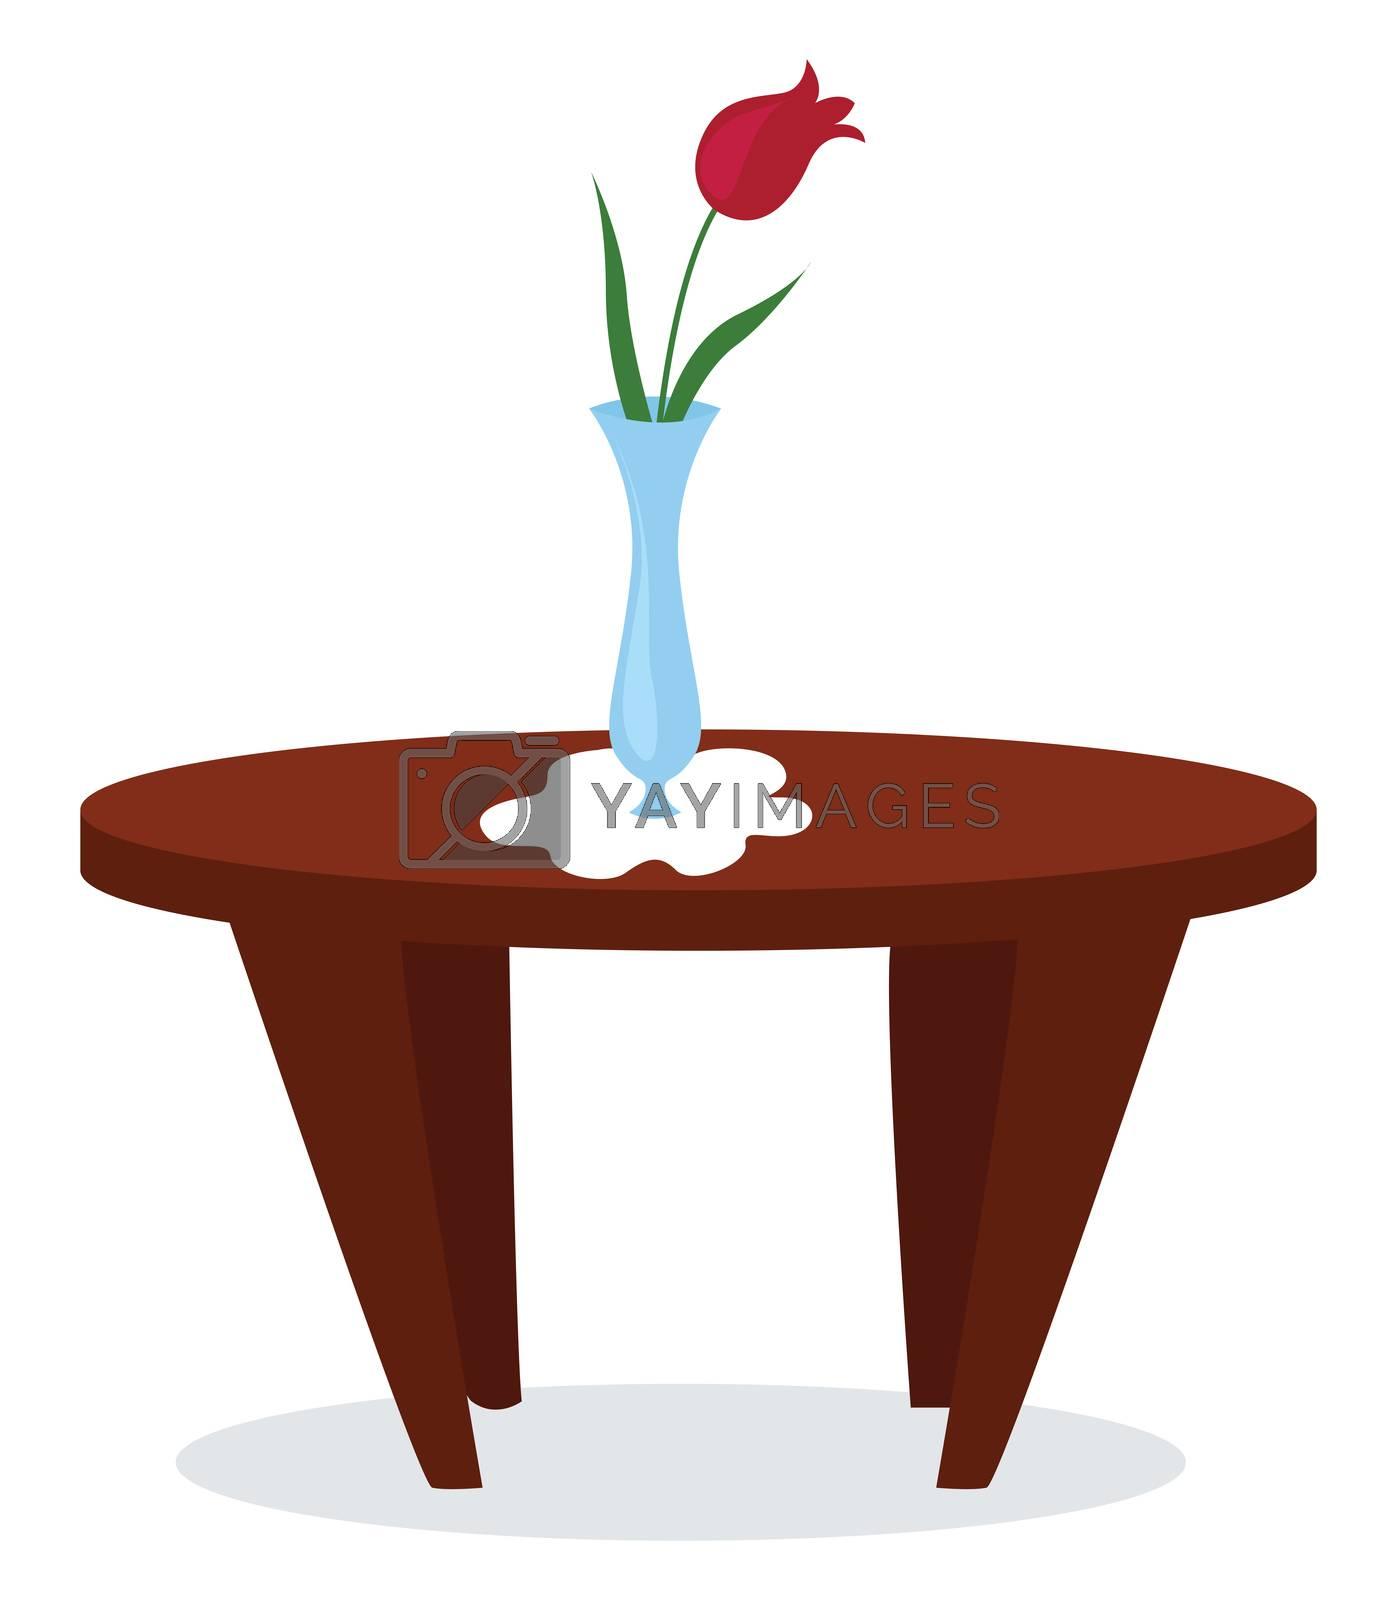 Vase with flower on table , illustration, vector on white background